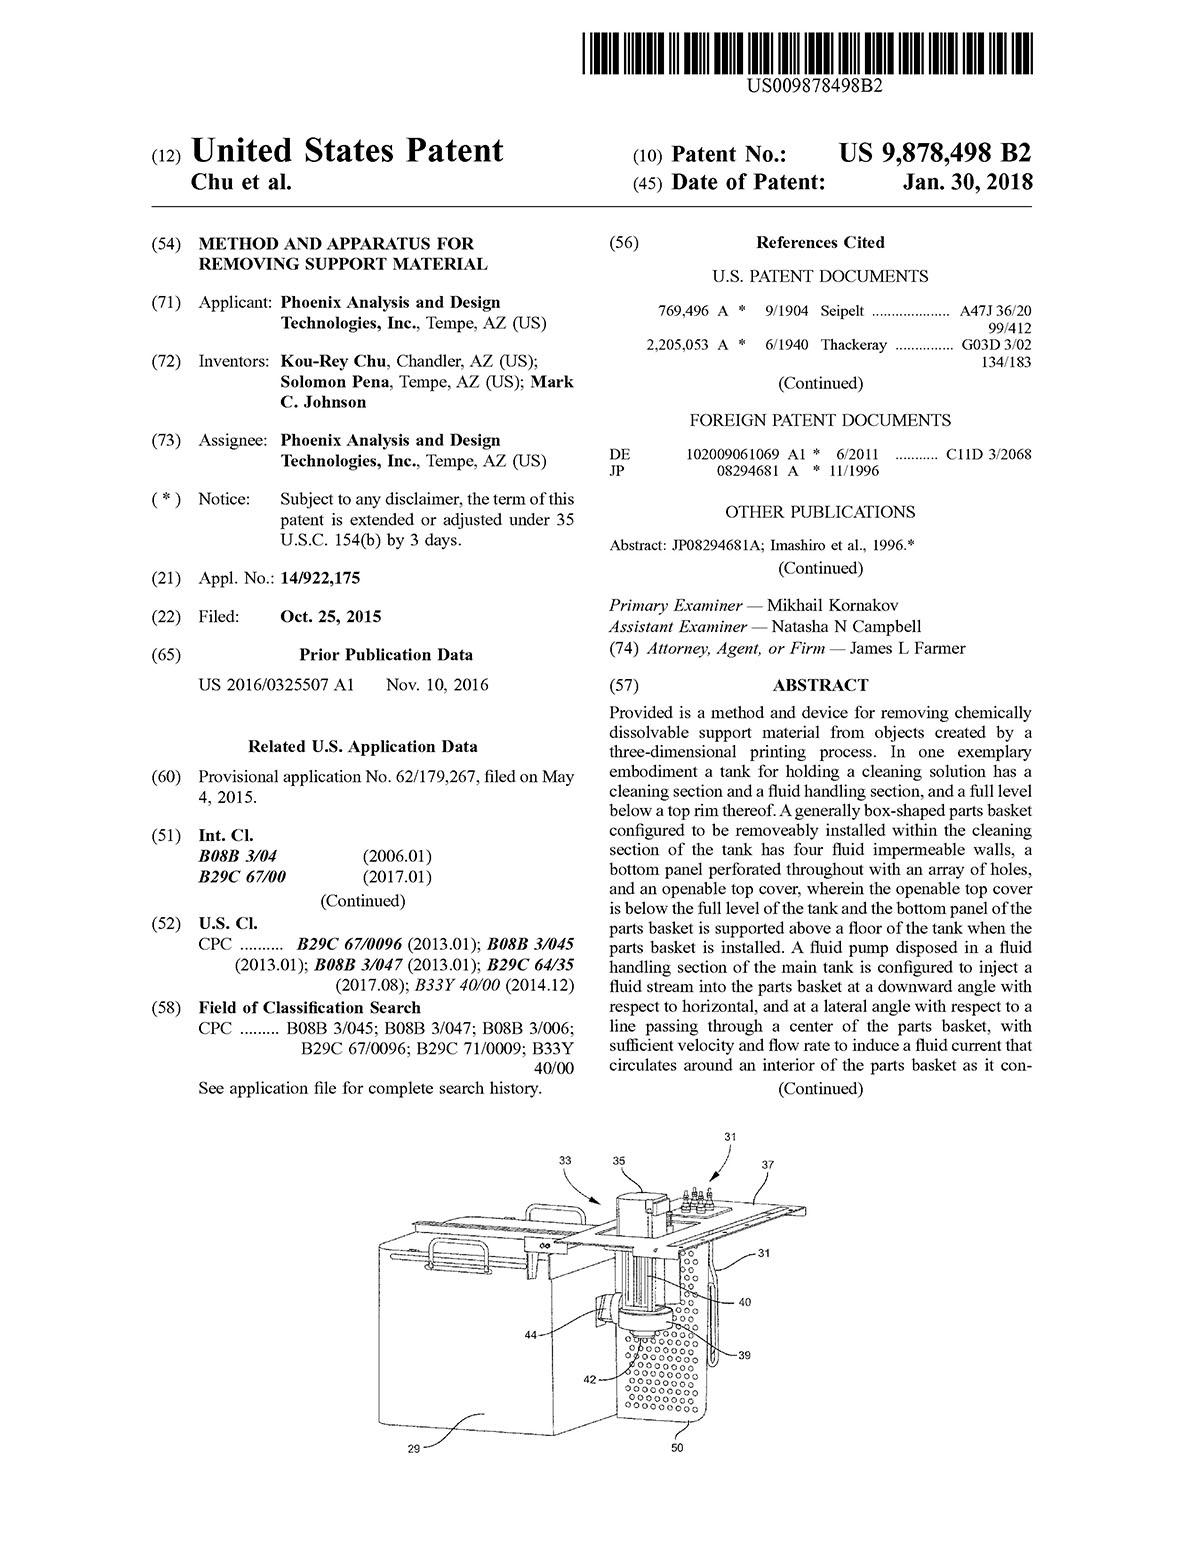 PADT Patent US9878498